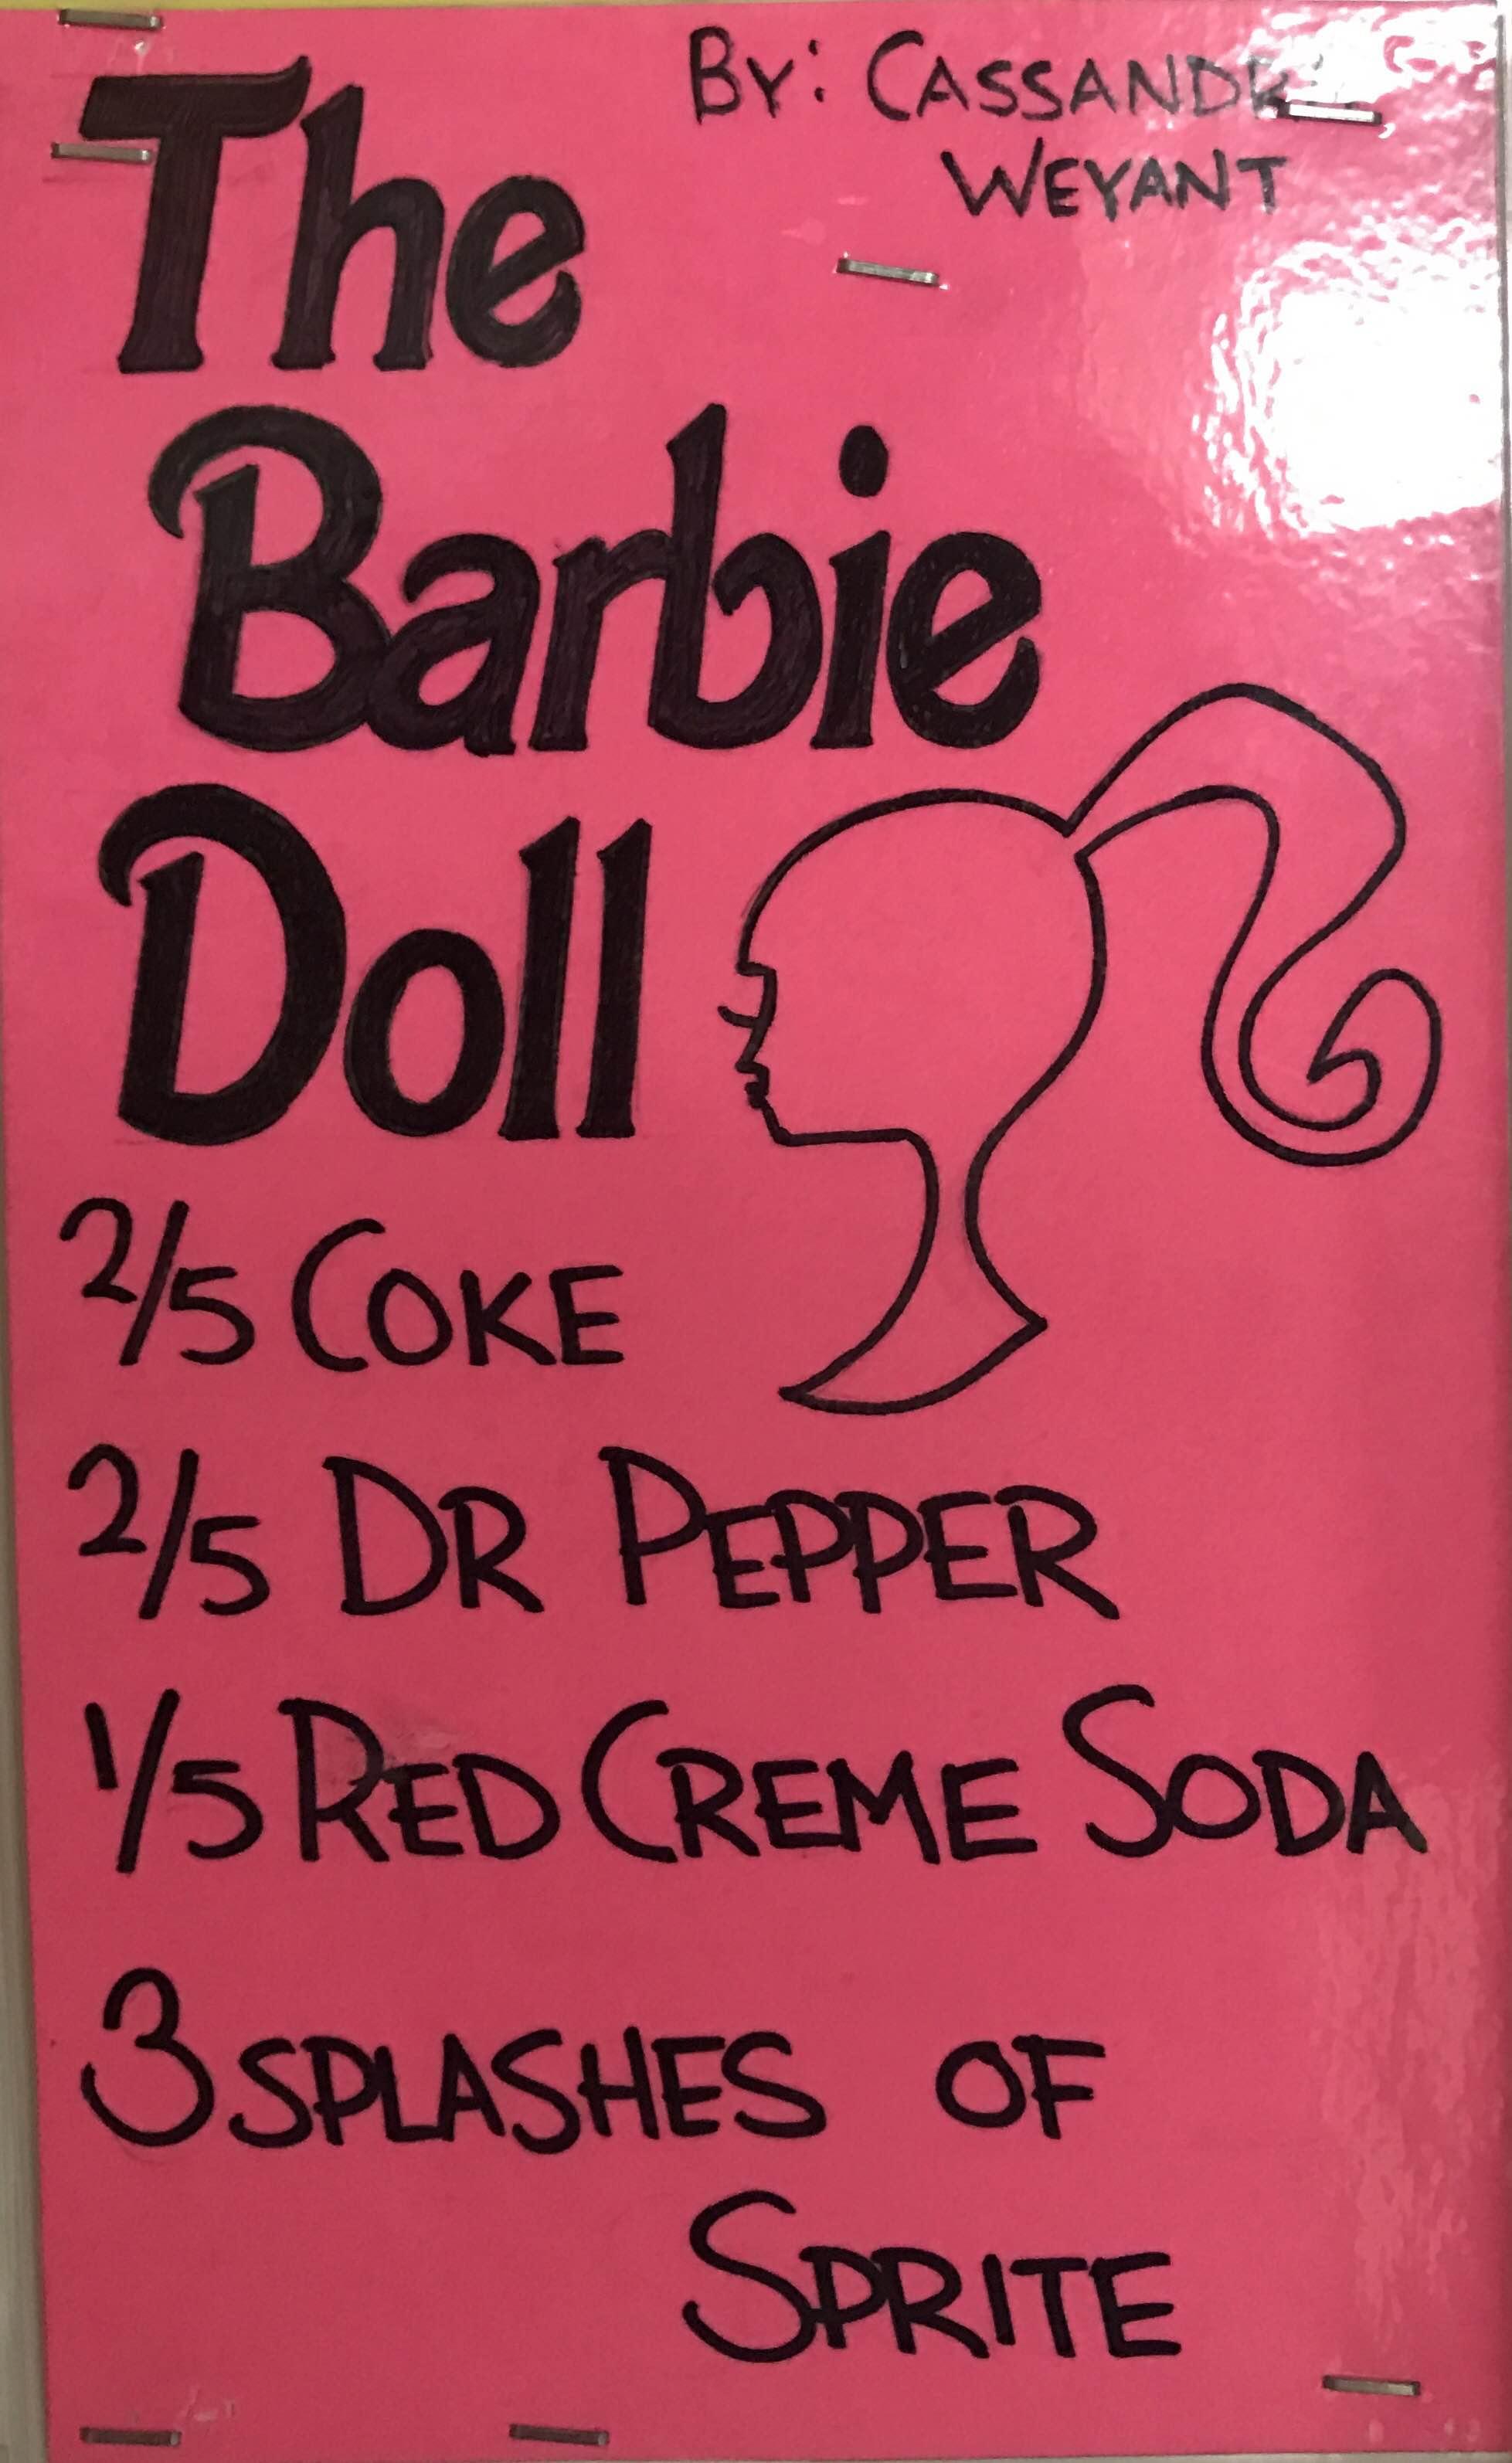 The Barbie Doll.JPG